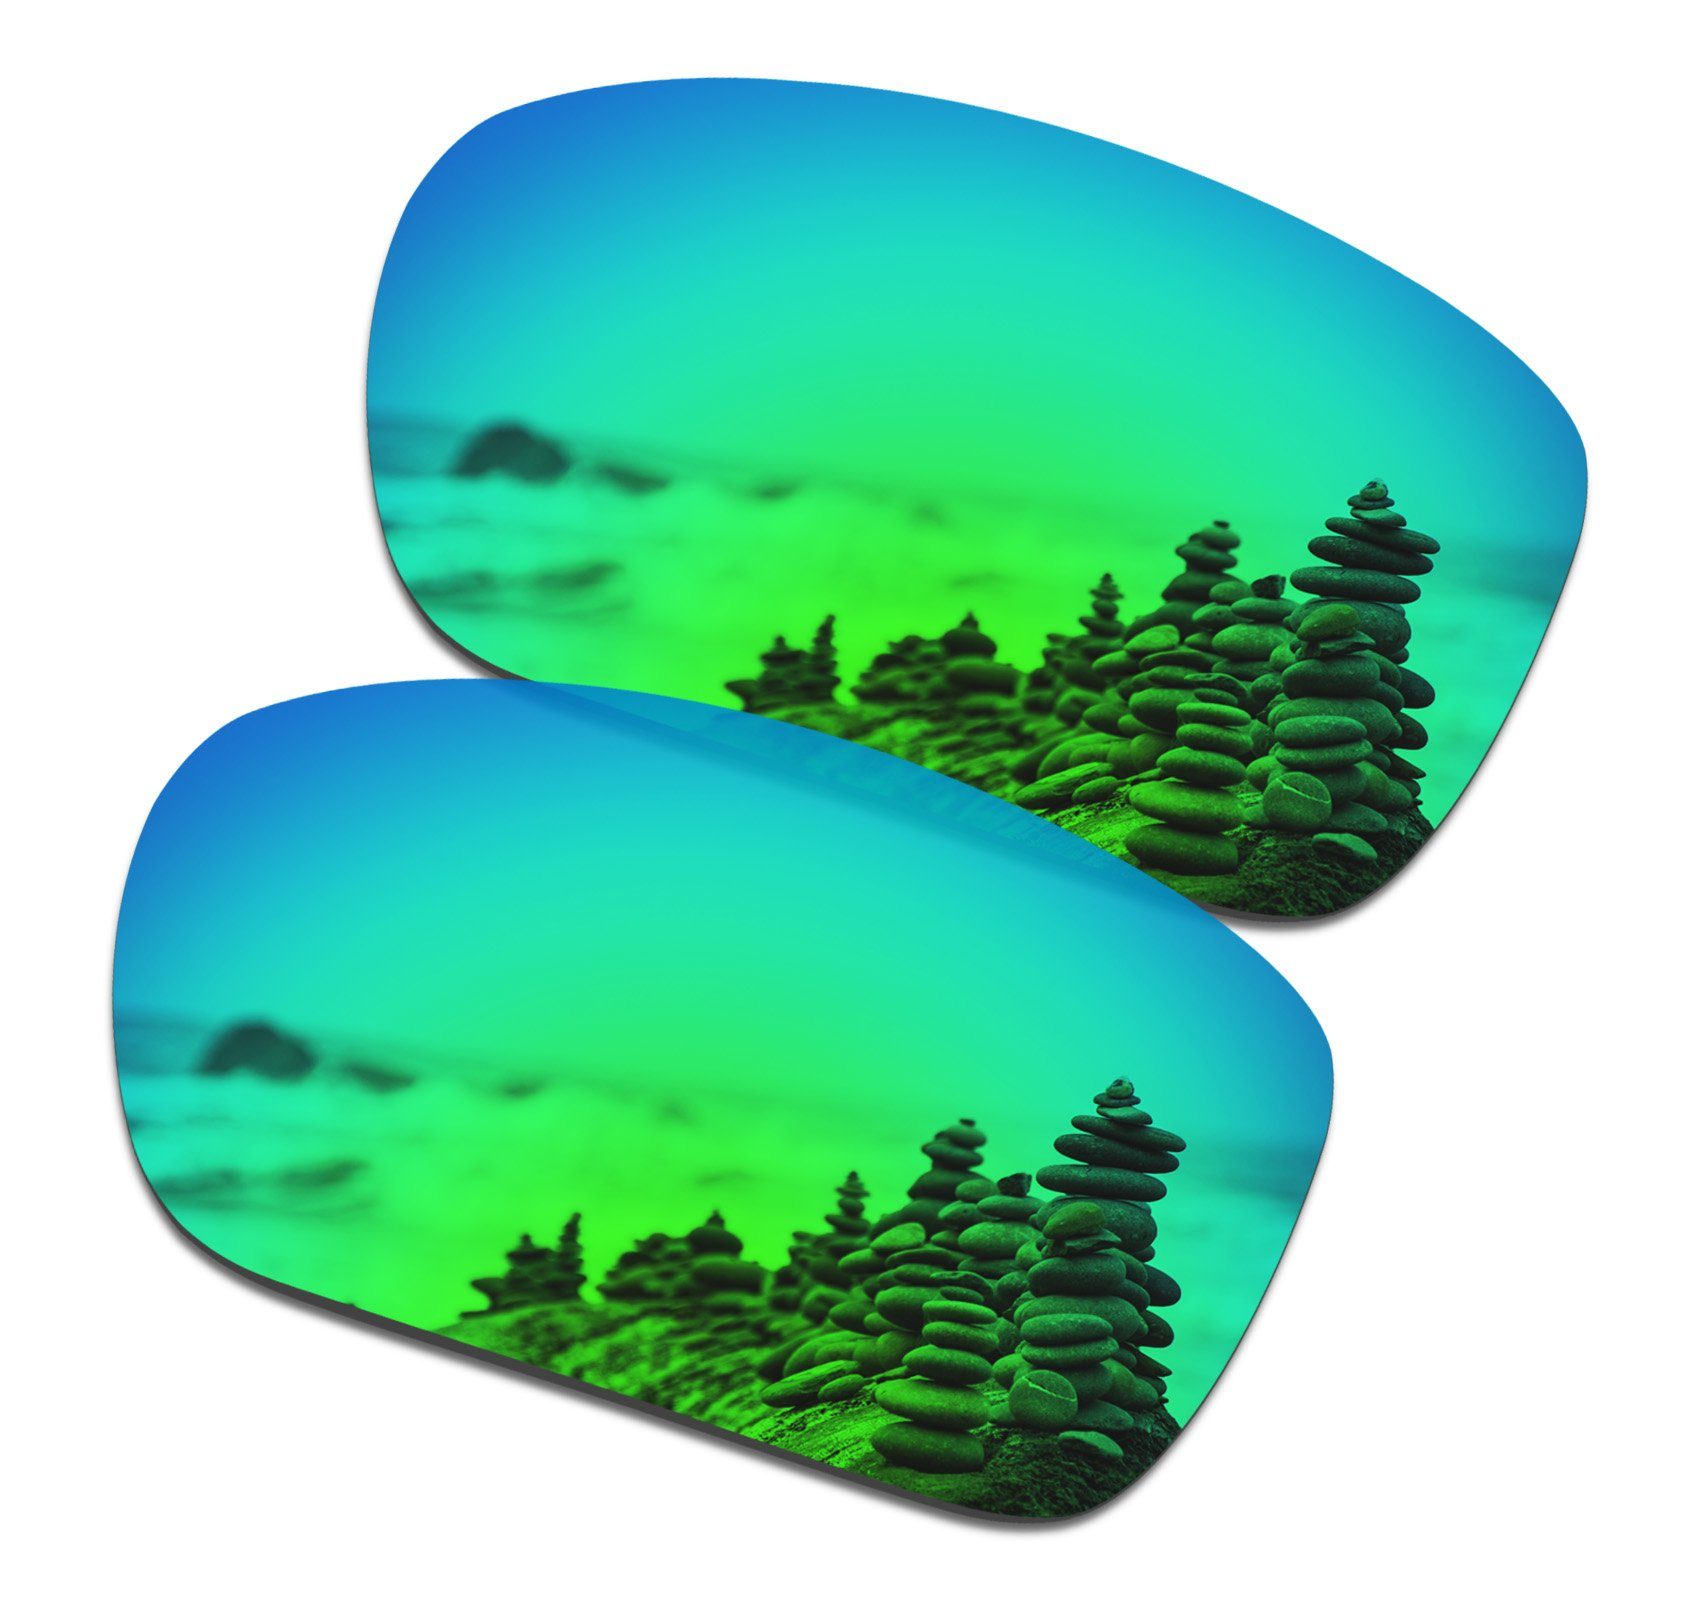 SmartVLT Men's Emerald Green Replacement Lenses for Oakley TwoFace Sunglass by SmartVLT